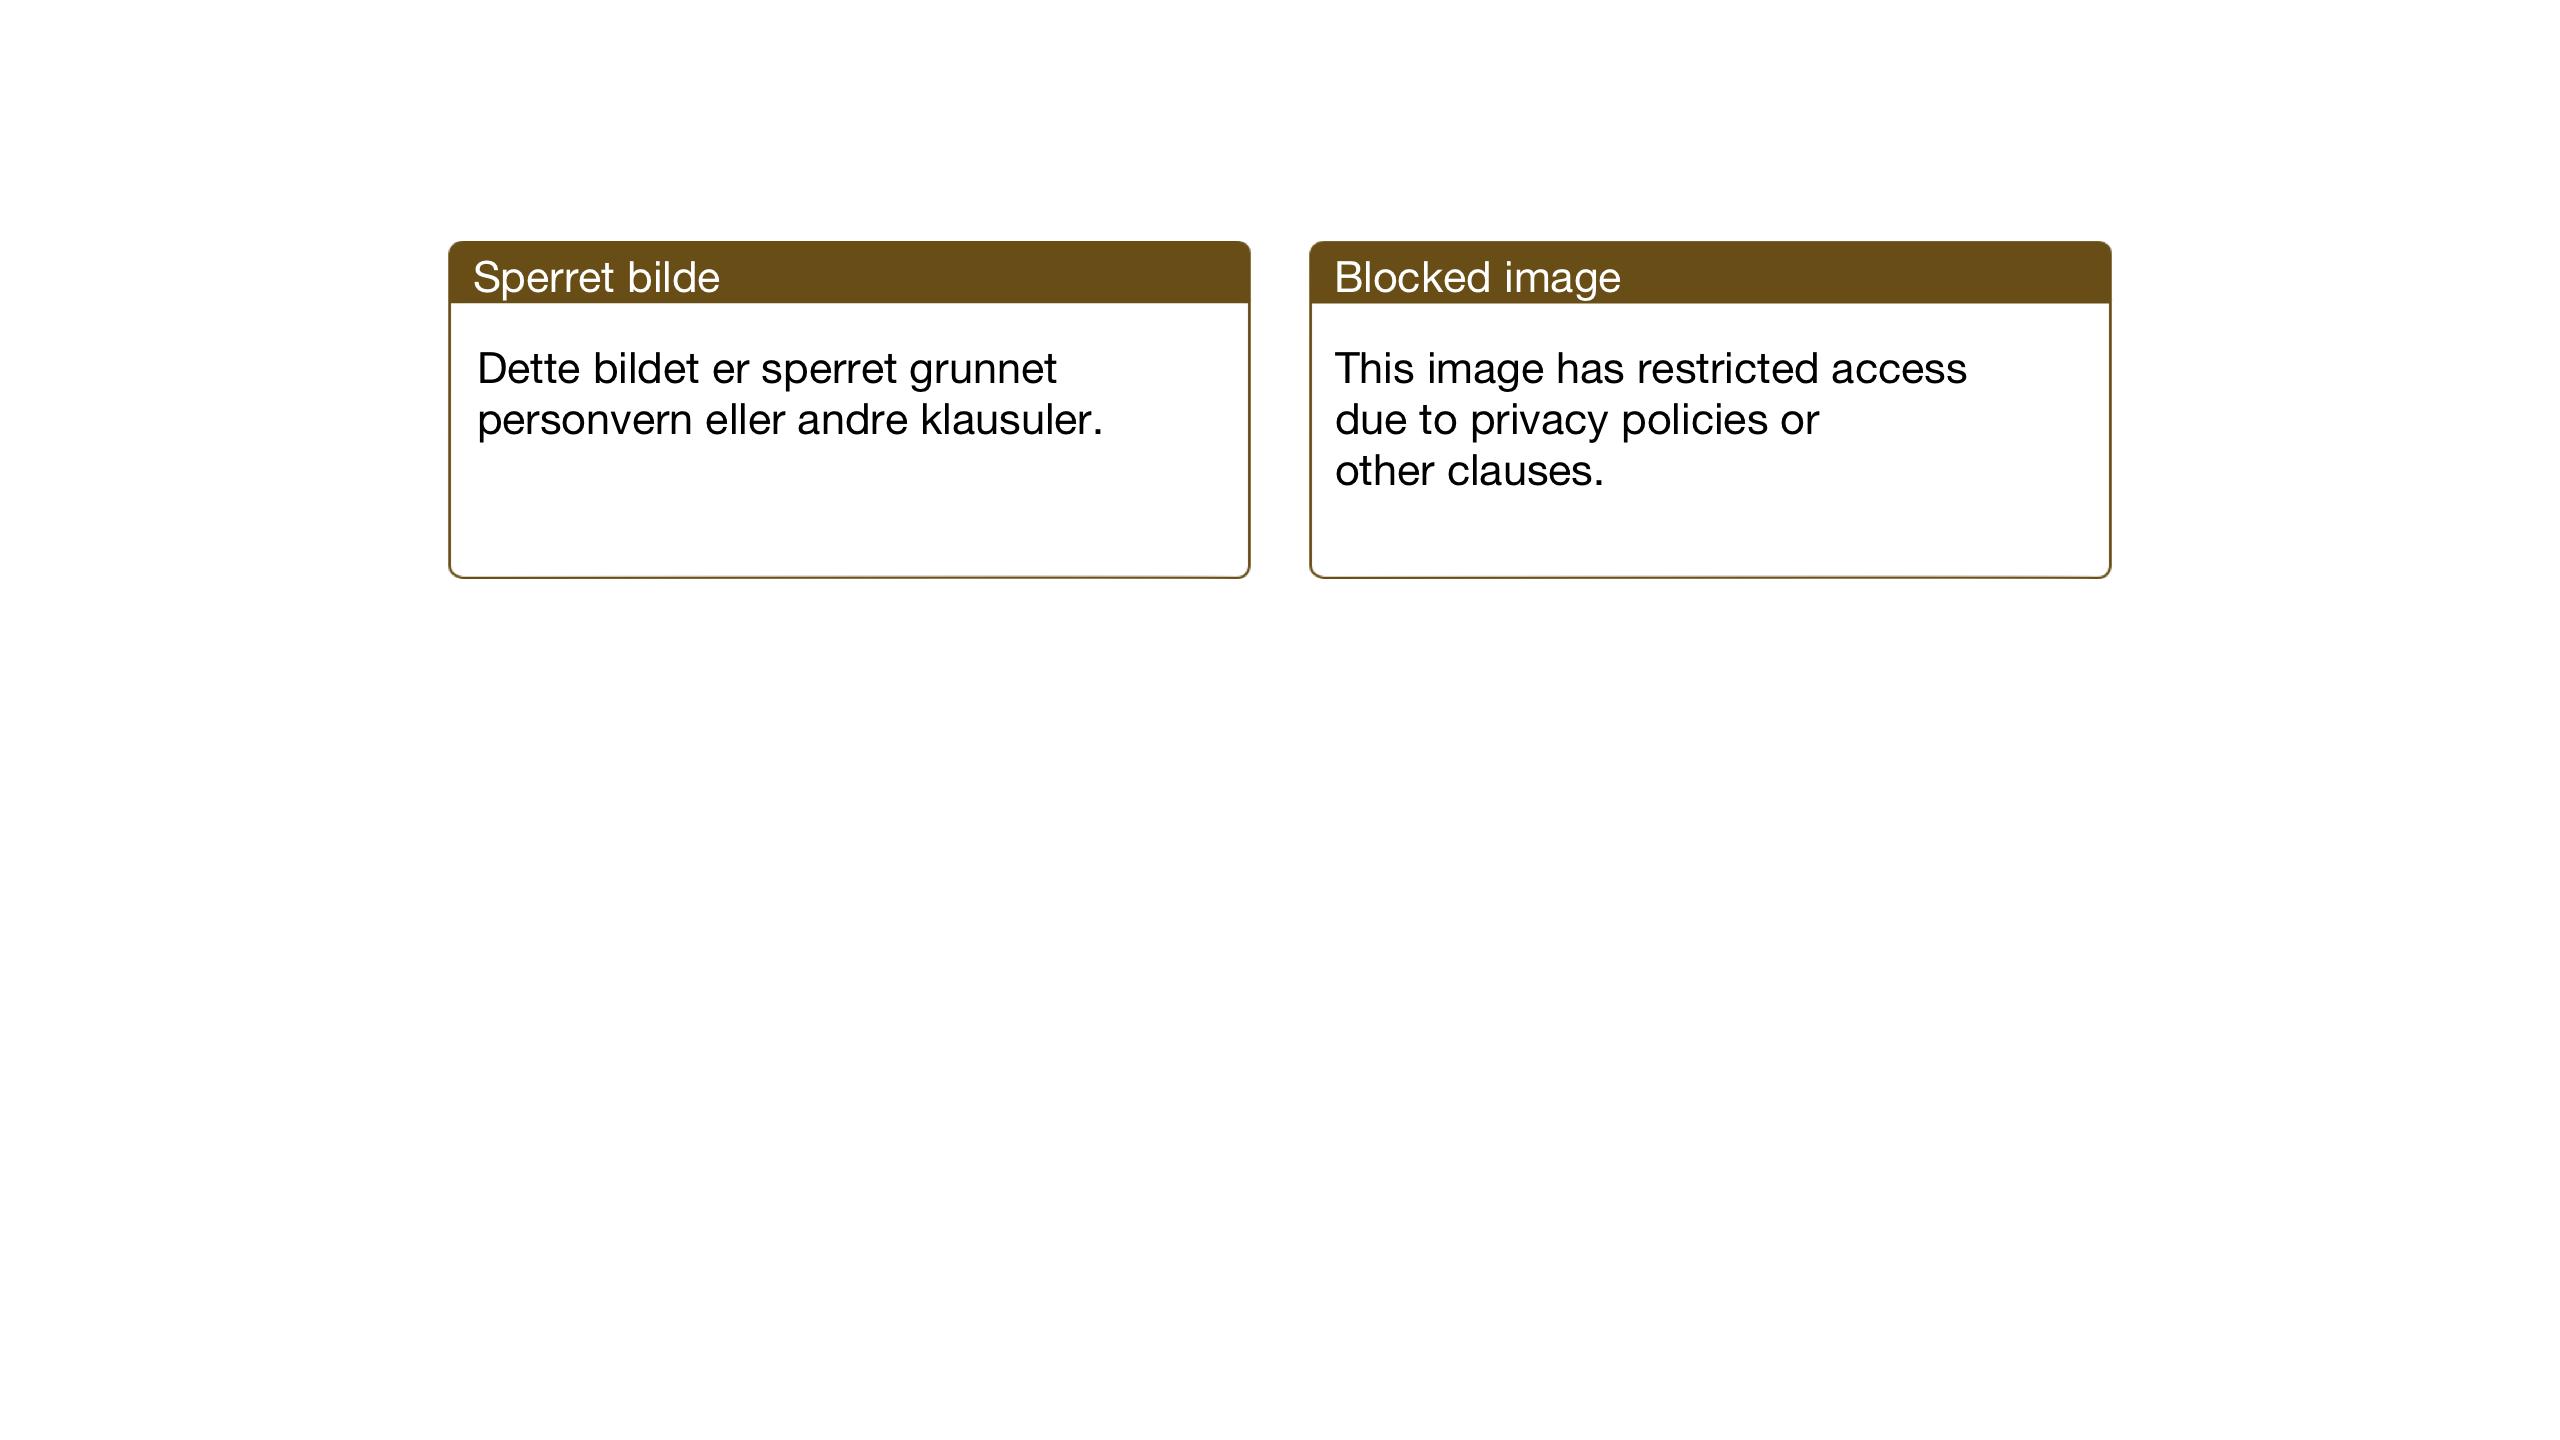 SAT, Ministerialprotokoller, klokkerbøker og fødselsregistre - Nordland, 847/L0680: Klokkerbok nr. 847C08, 1930-1947, s. 201